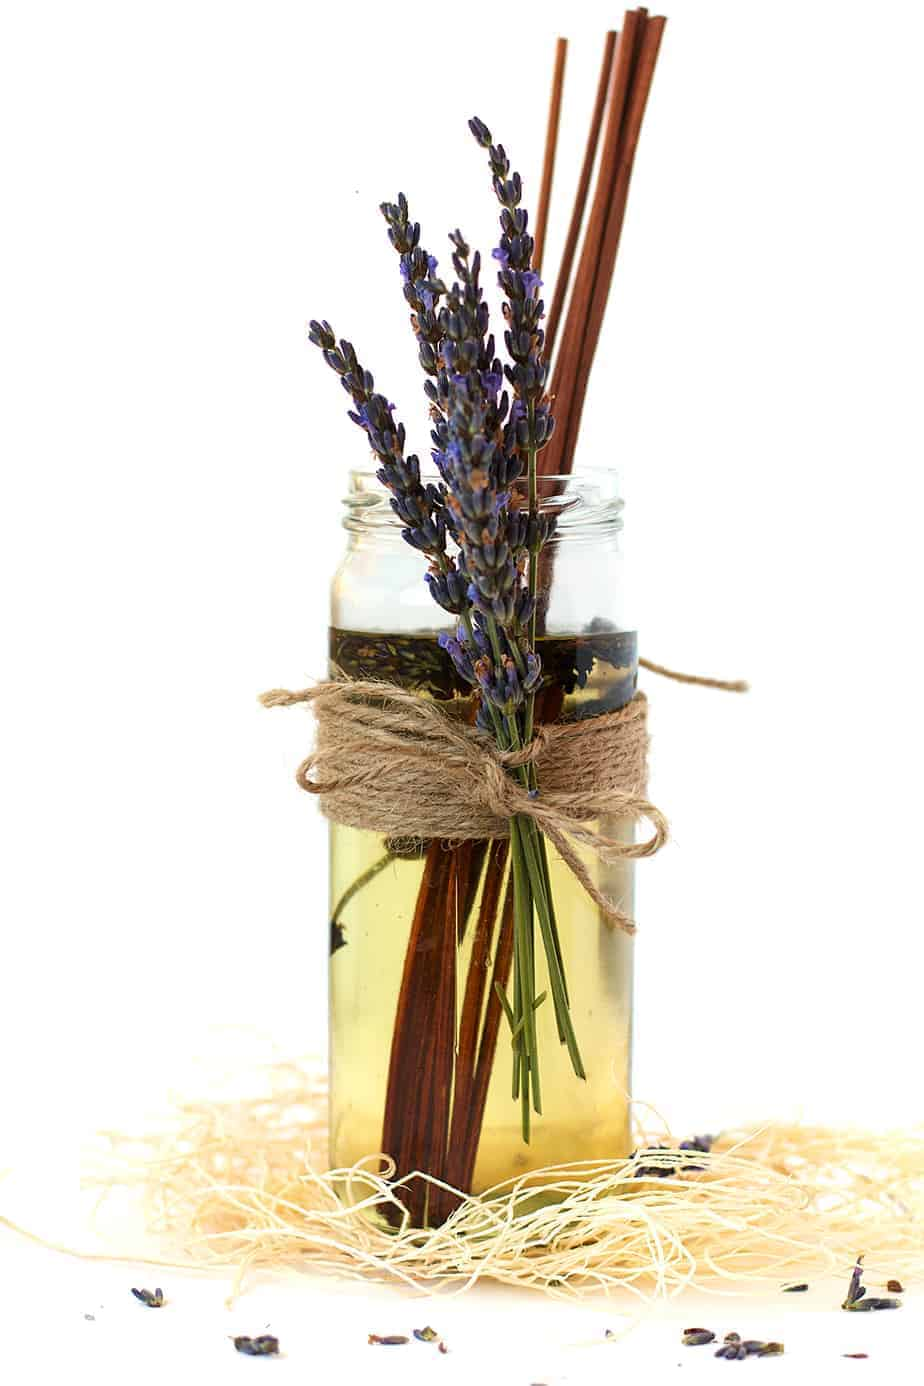 Diy Lavender Oil Diffuser Posh Journal